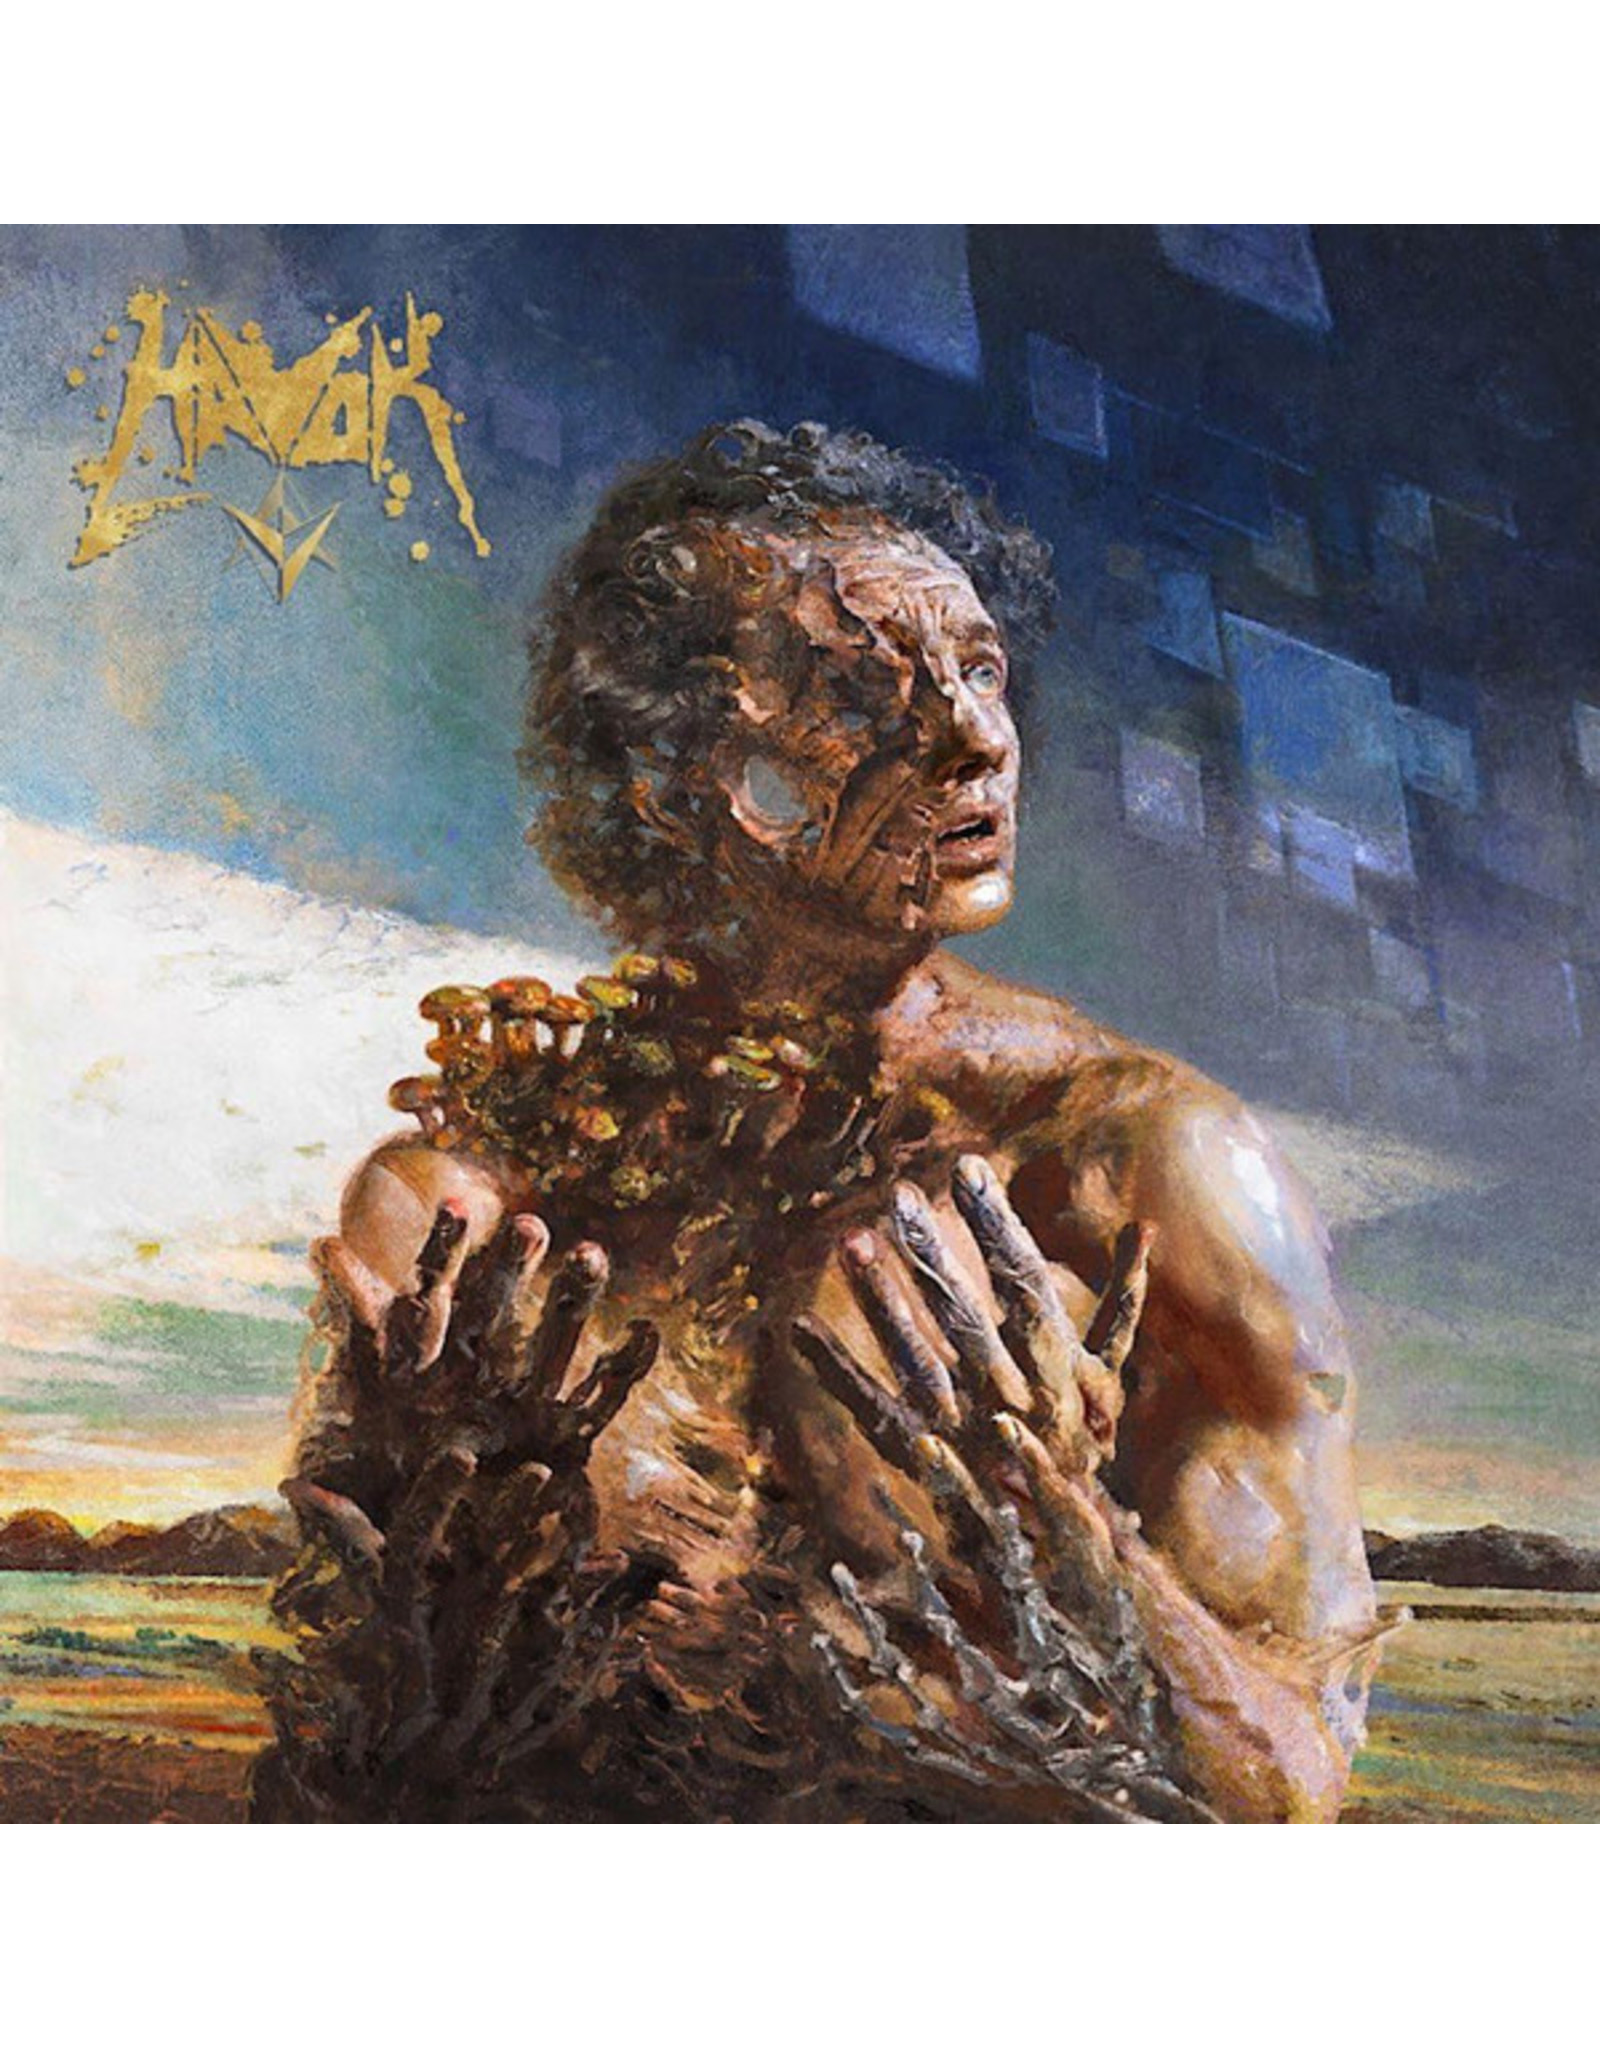 New Vinyl Havok - V (IEX) LP